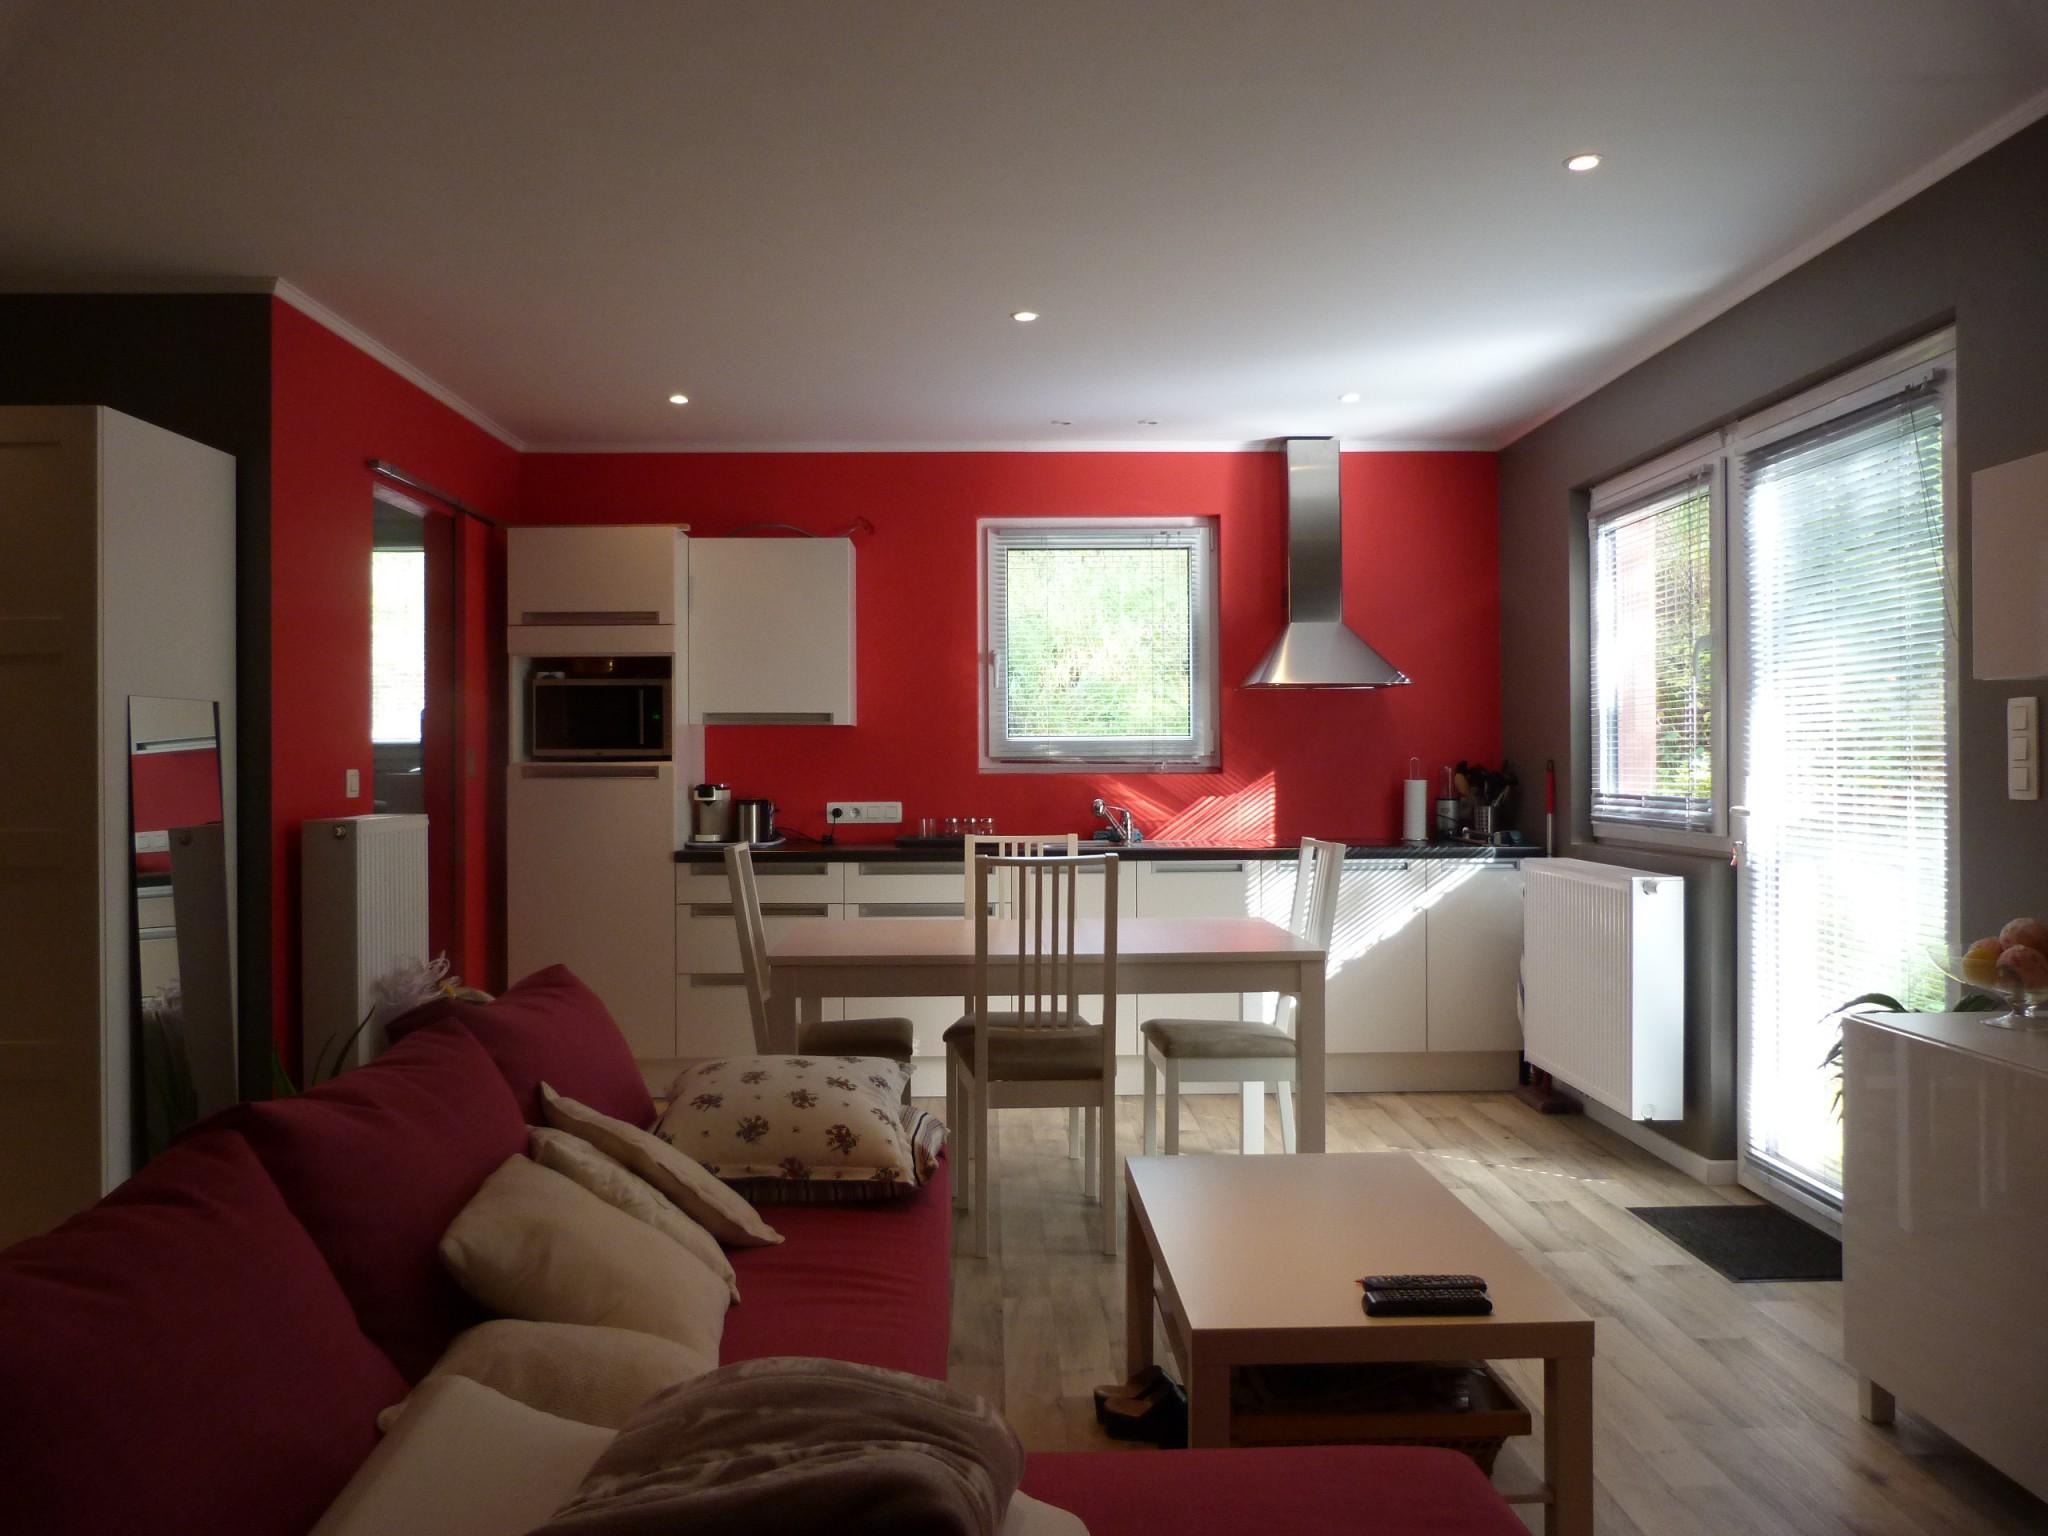 projet hs embourg bureau d 39 architecture tilkin. Black Bedroom Furniture Sets. Home Design Ideas